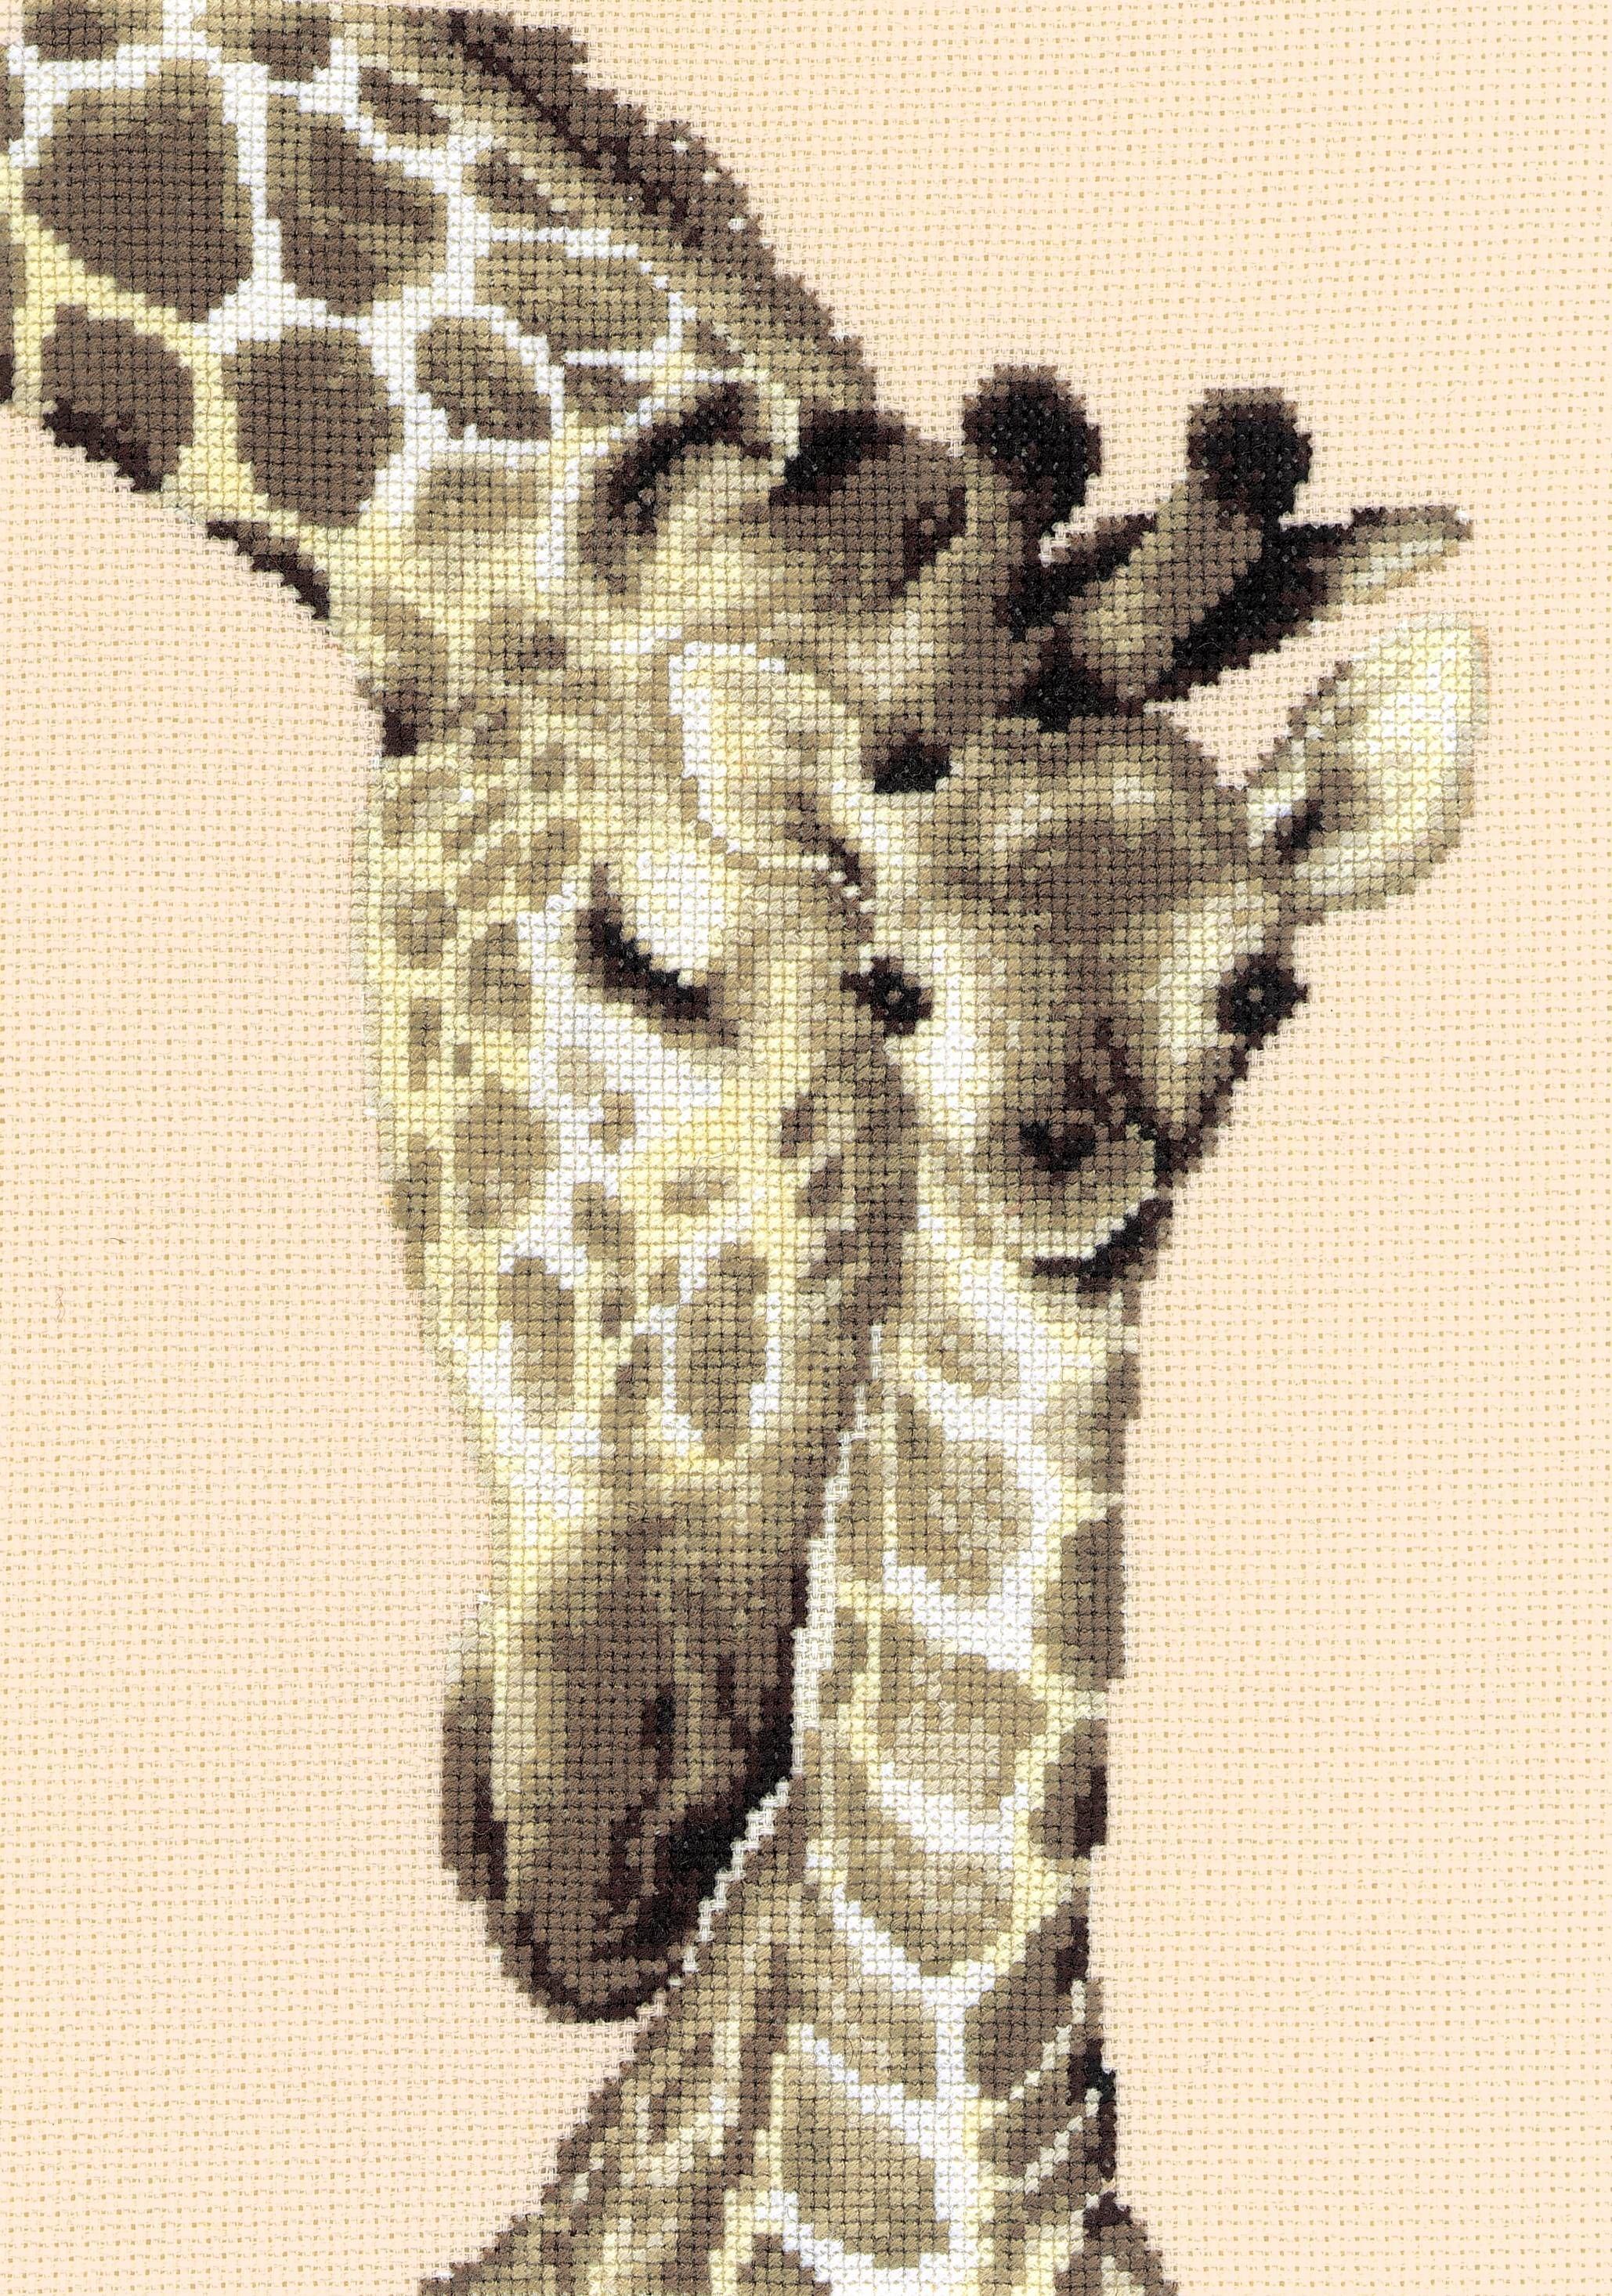 Giraffe Counted Cross Stitch Kit Wildlife//Animals